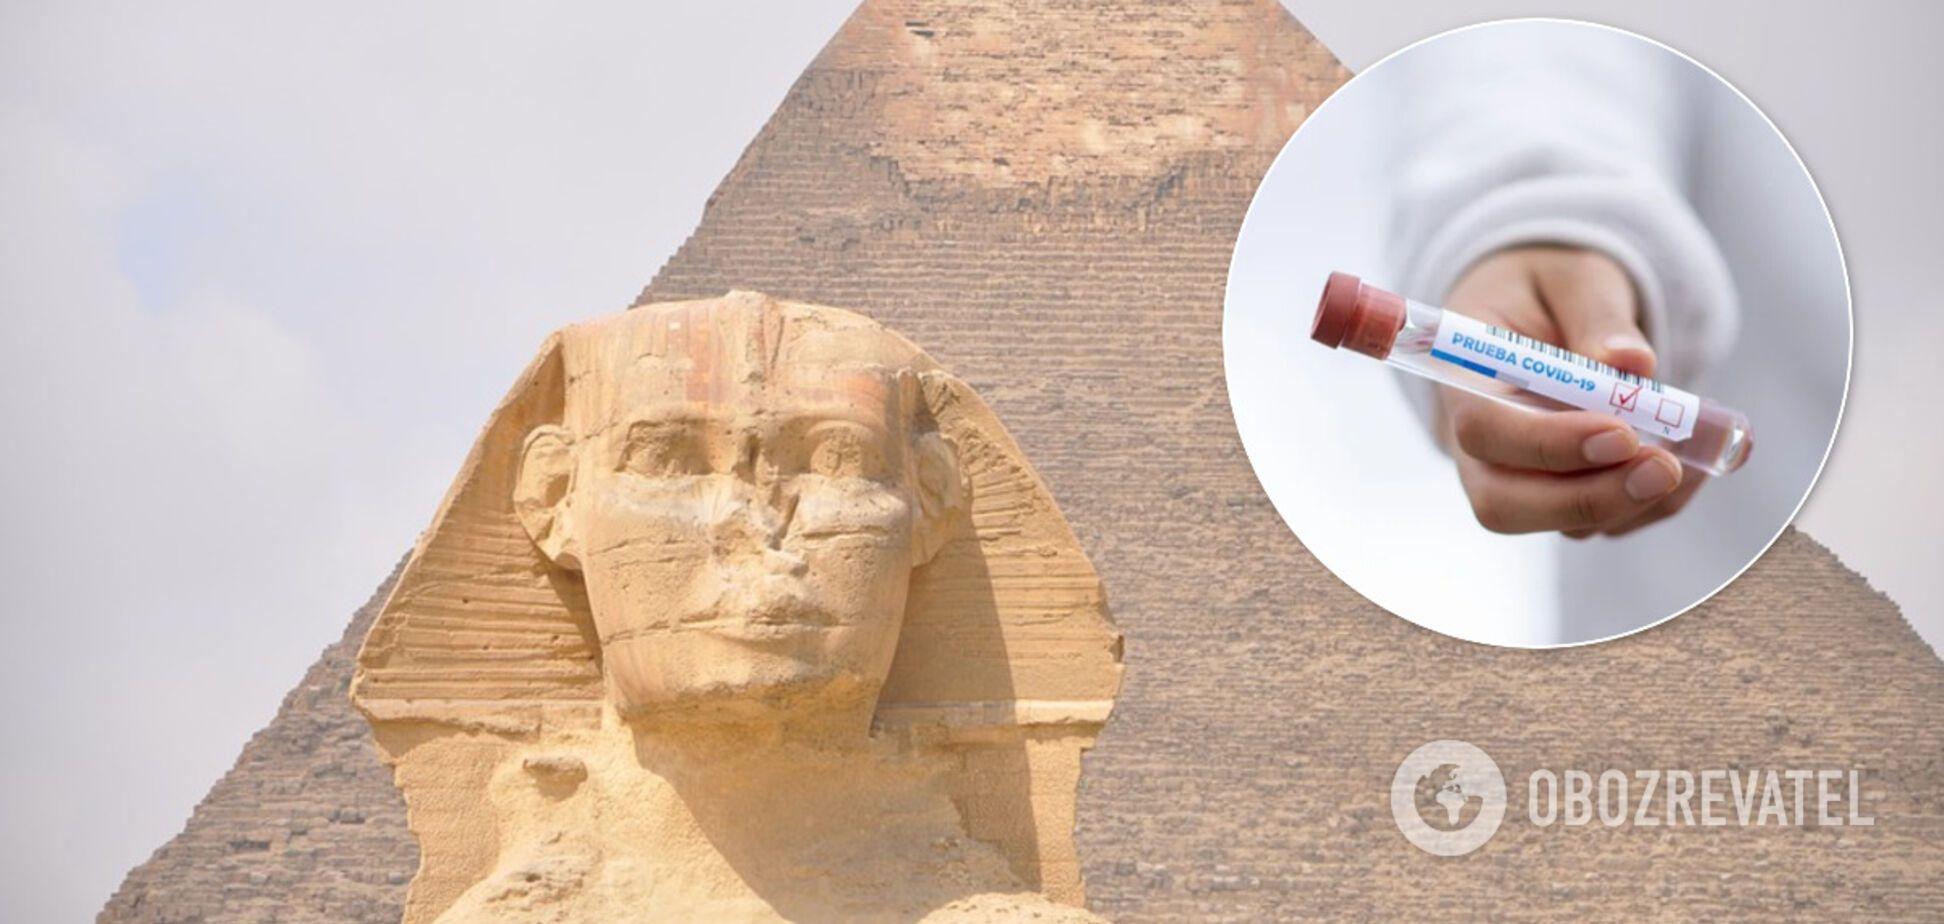 Три курорта и дистанция: Египет назвал условия приема туристов